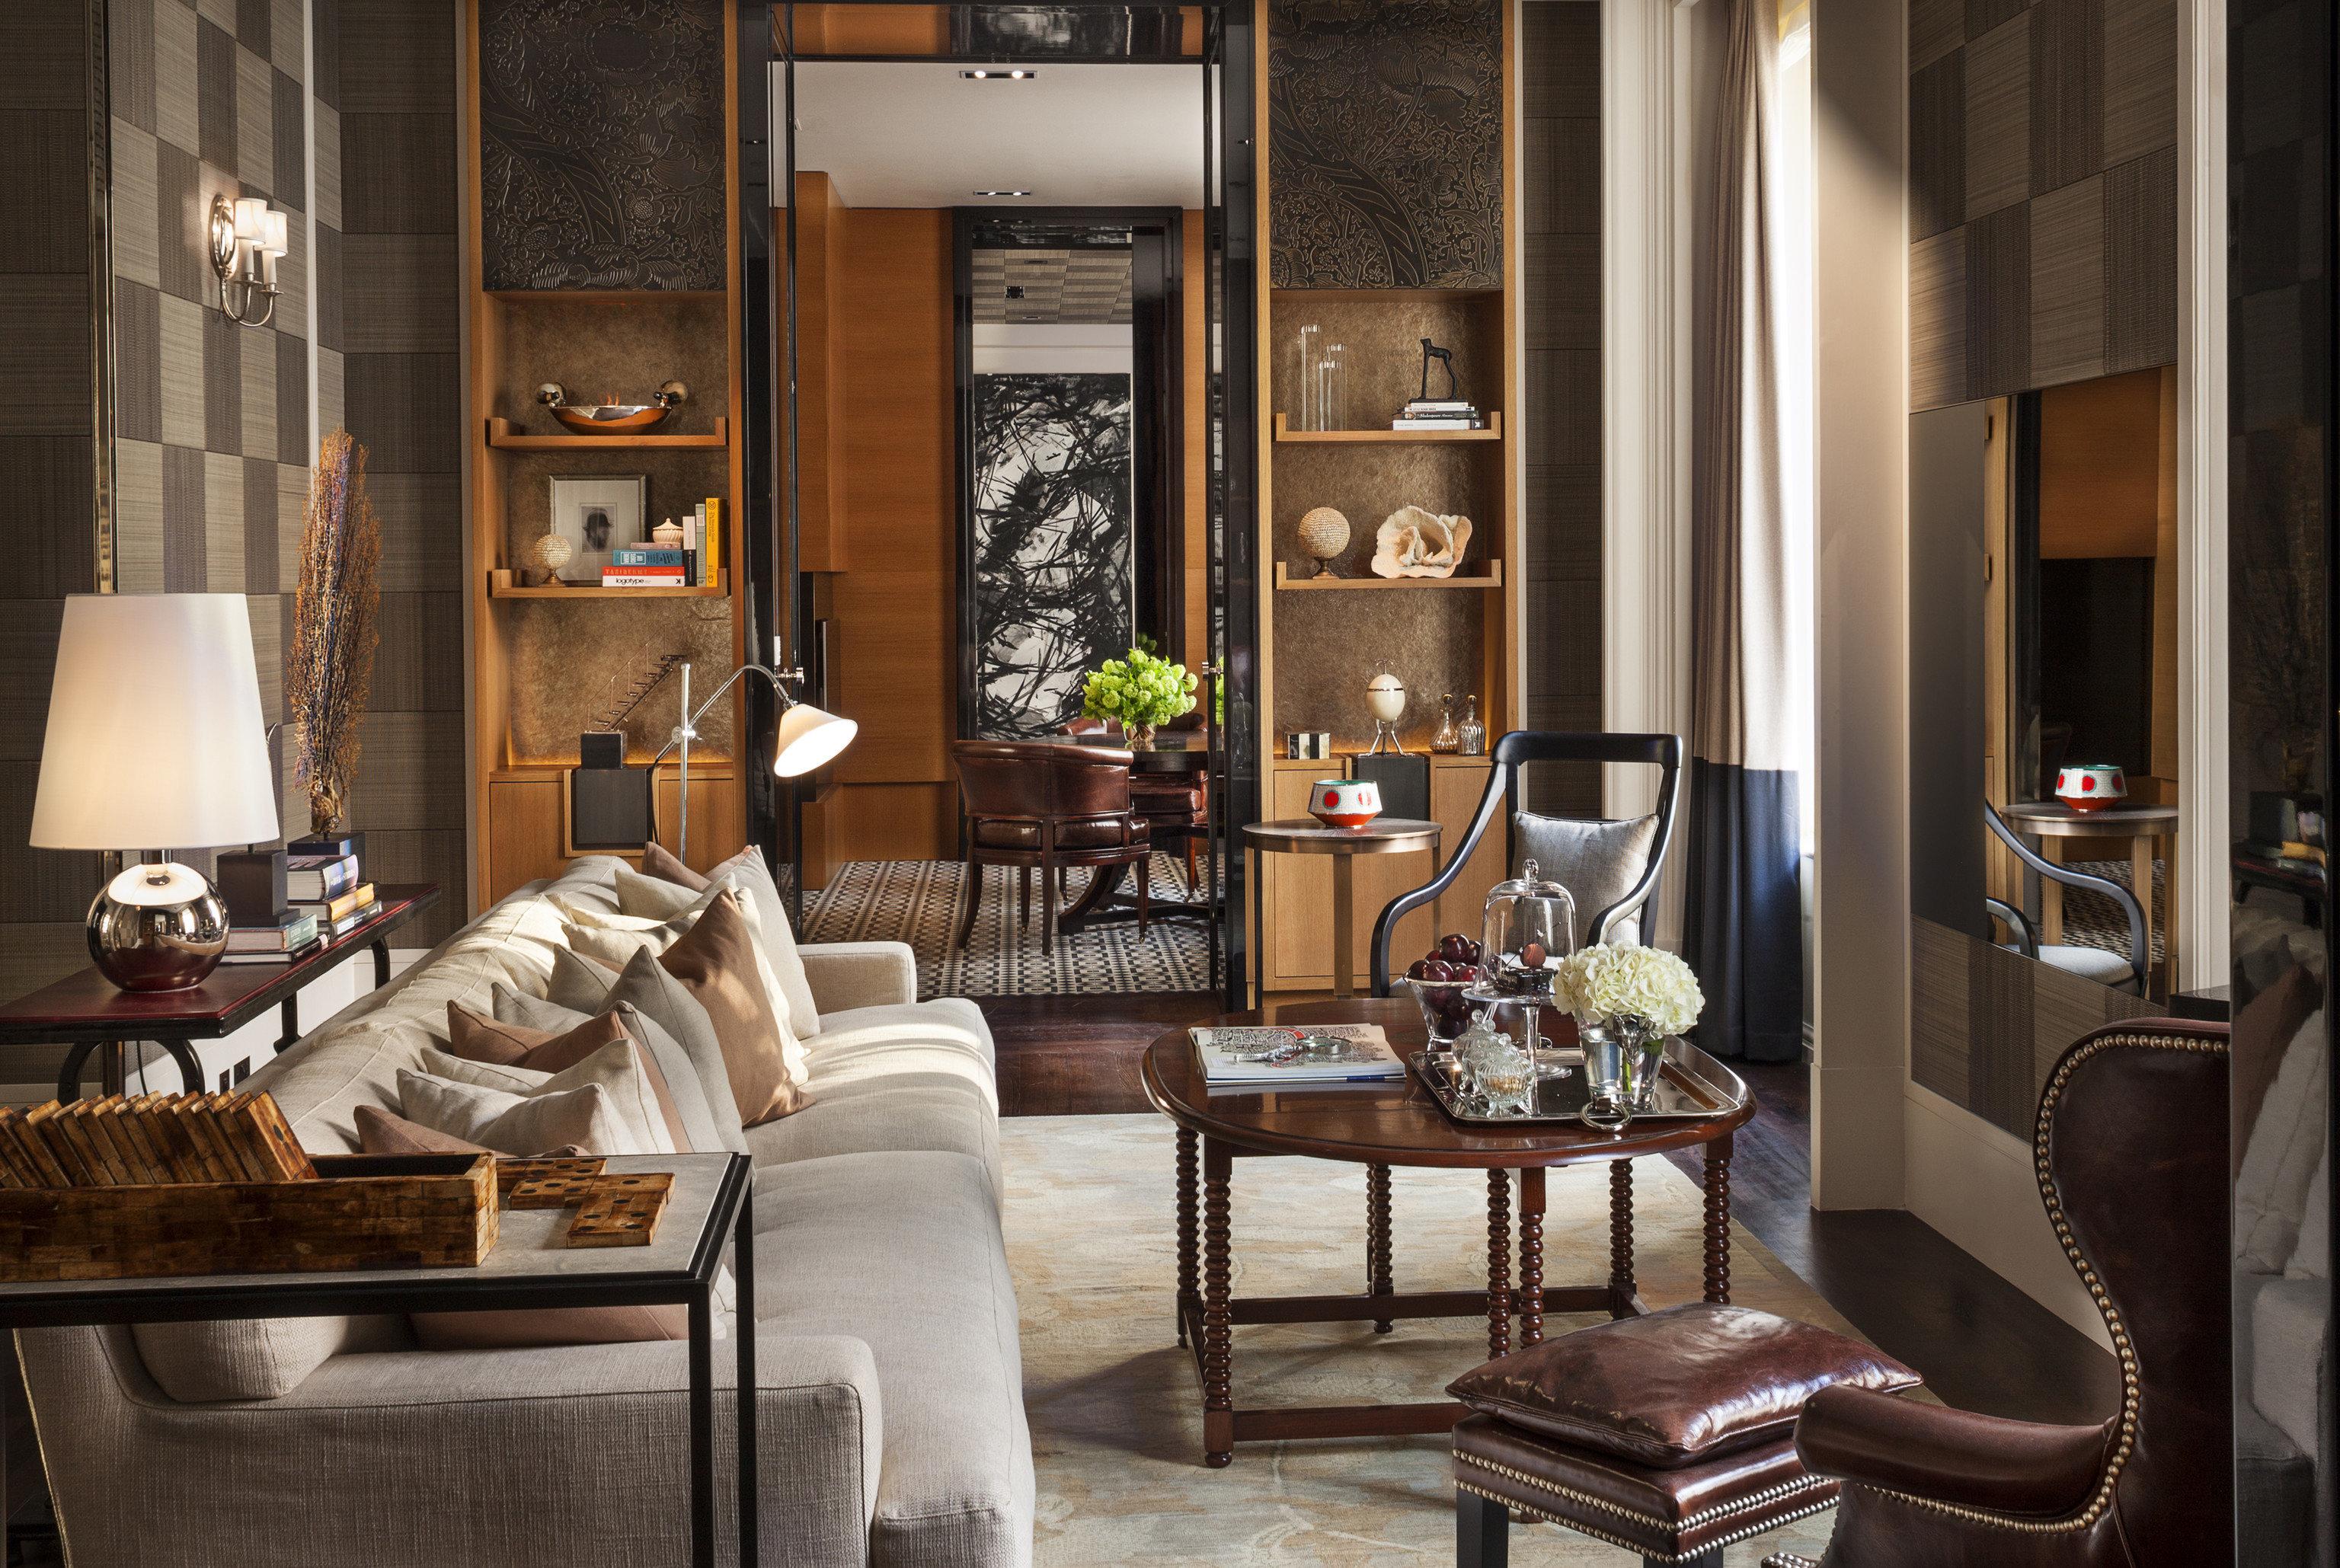 Hotels Luxury Travel interior design Living room living room furniture window Lobby